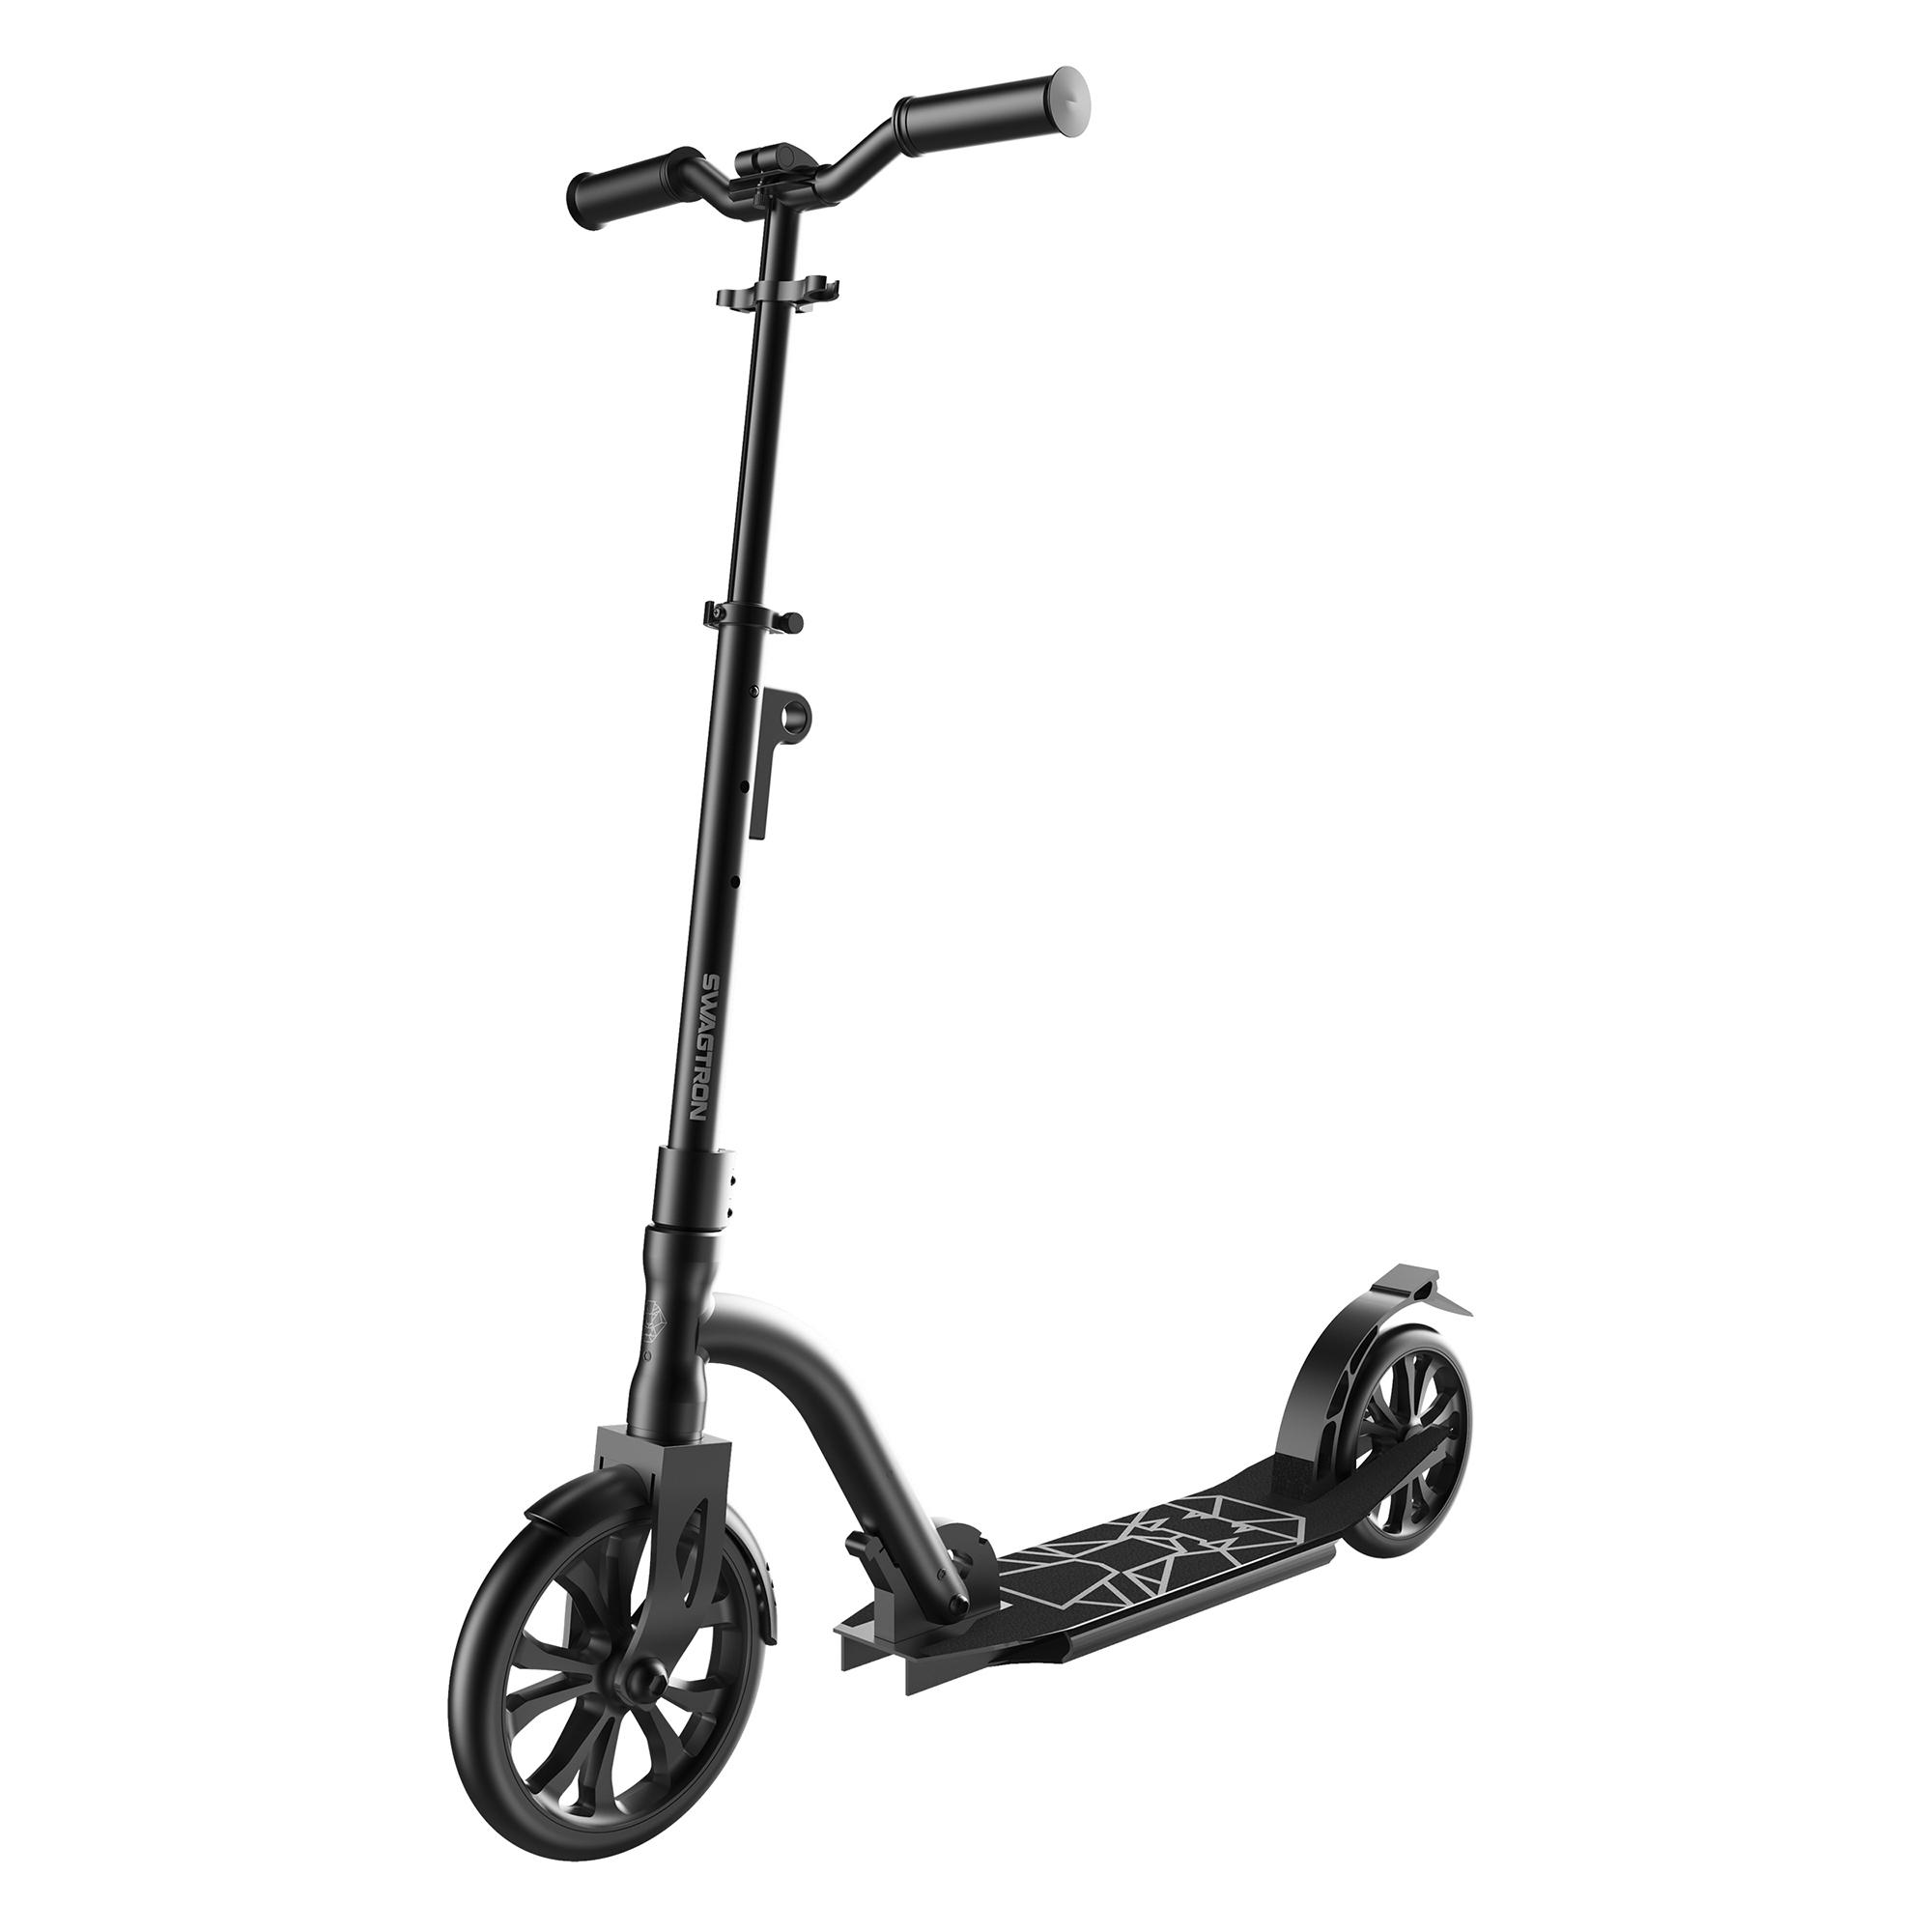 Swagtron Folding Electric Kick Scooter